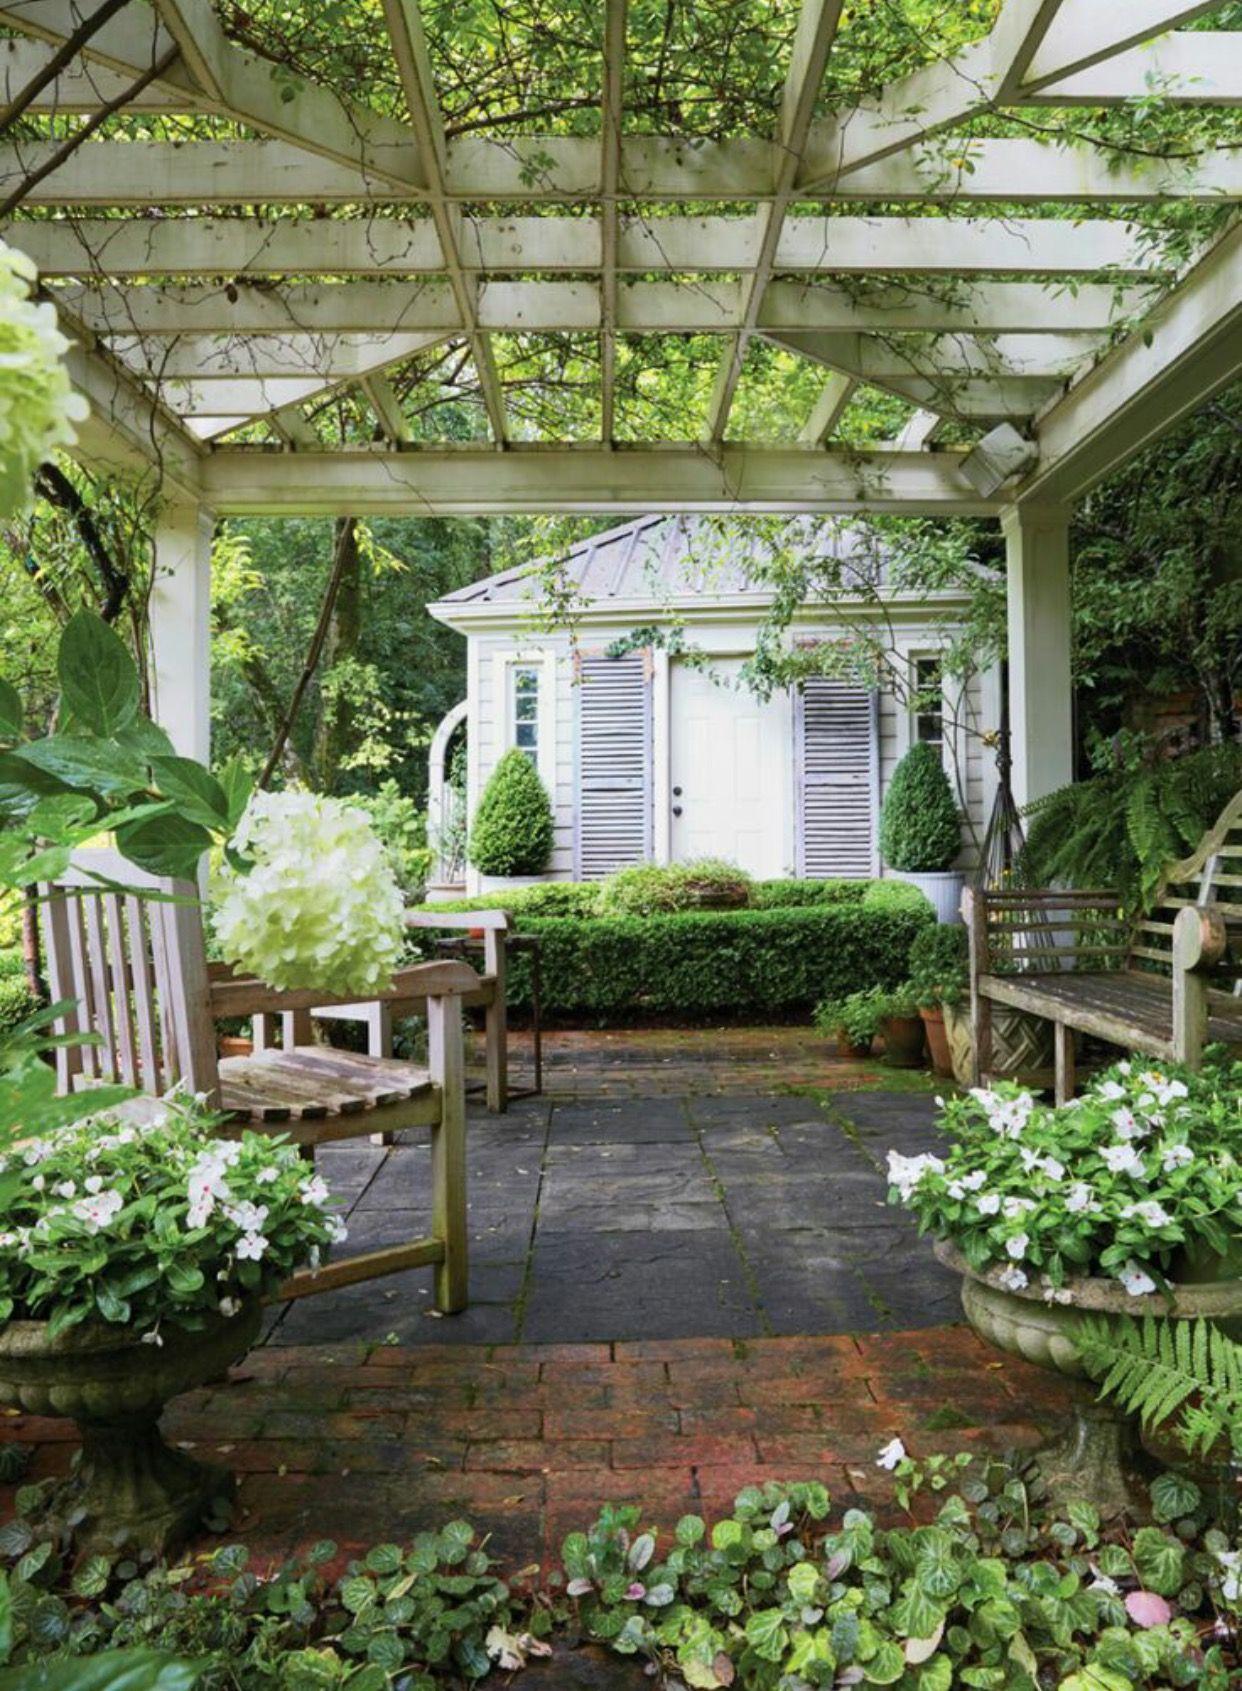 Pin by Halina on gardening in 2018 | Pinterest | Jardins ...